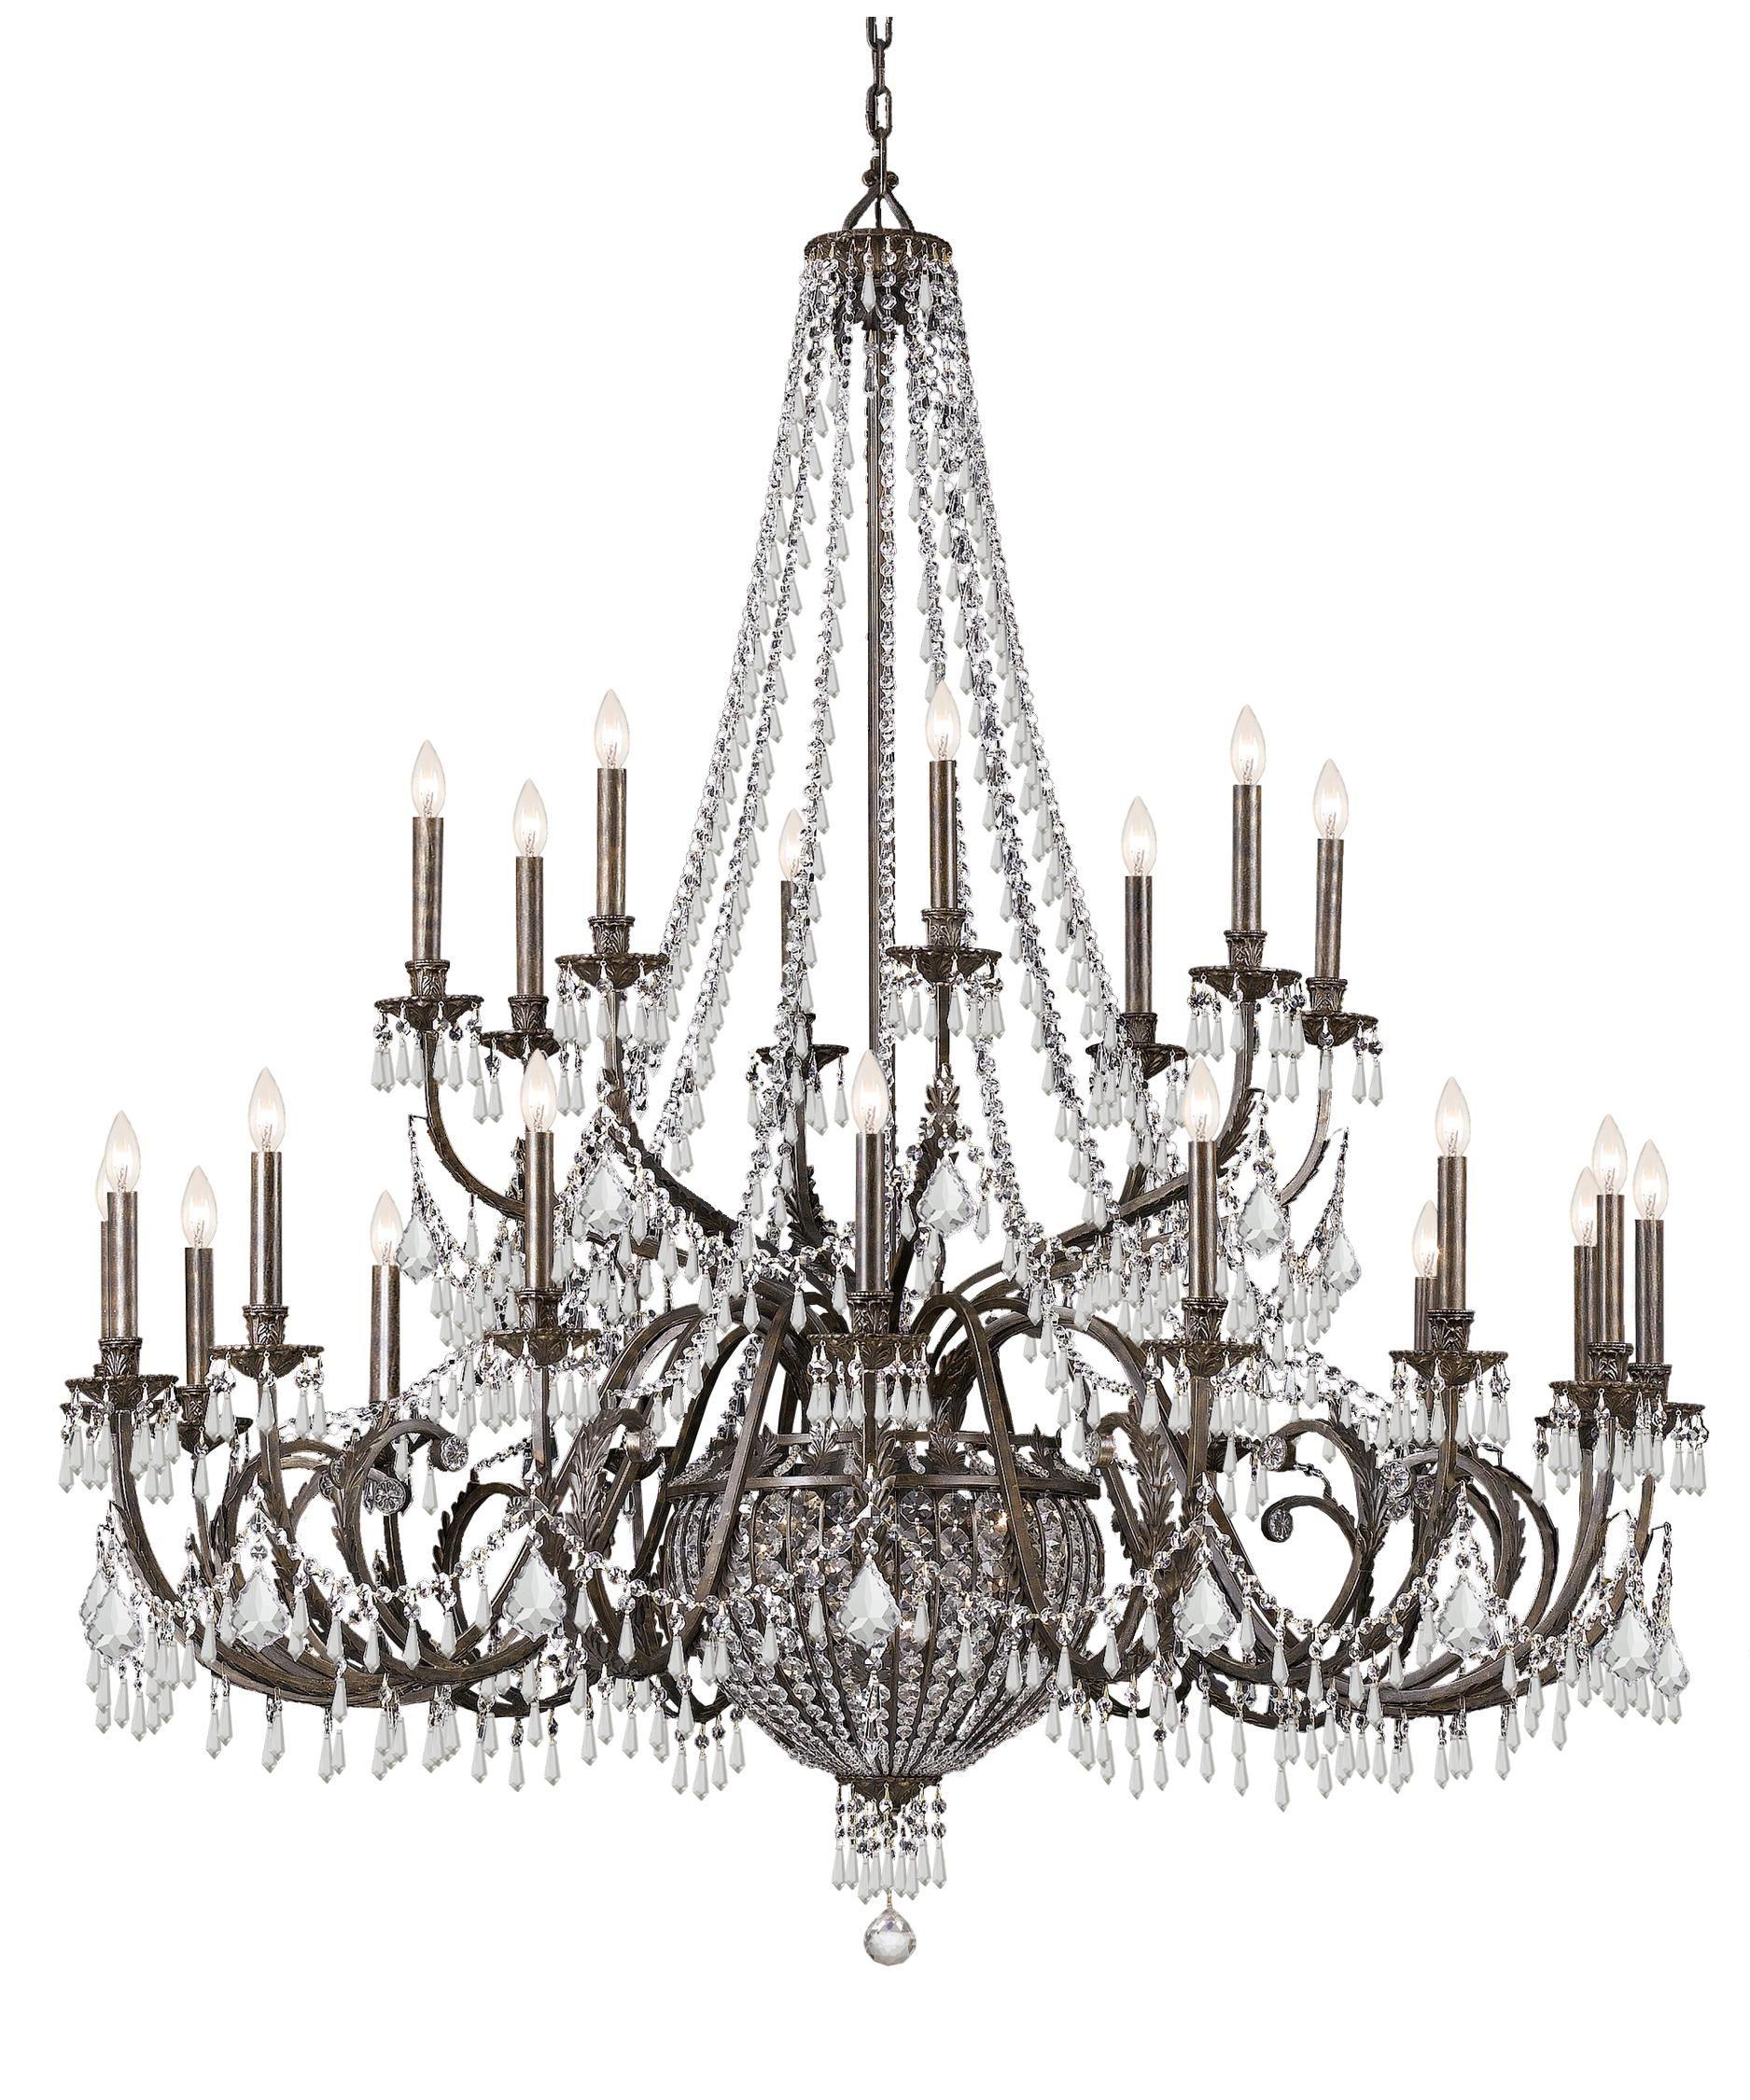 Vanderbilt 60 Inch 29 Light Chandelier Capitol Lighting Crystorama Led Crystal Chandelier Bronze Chandelier